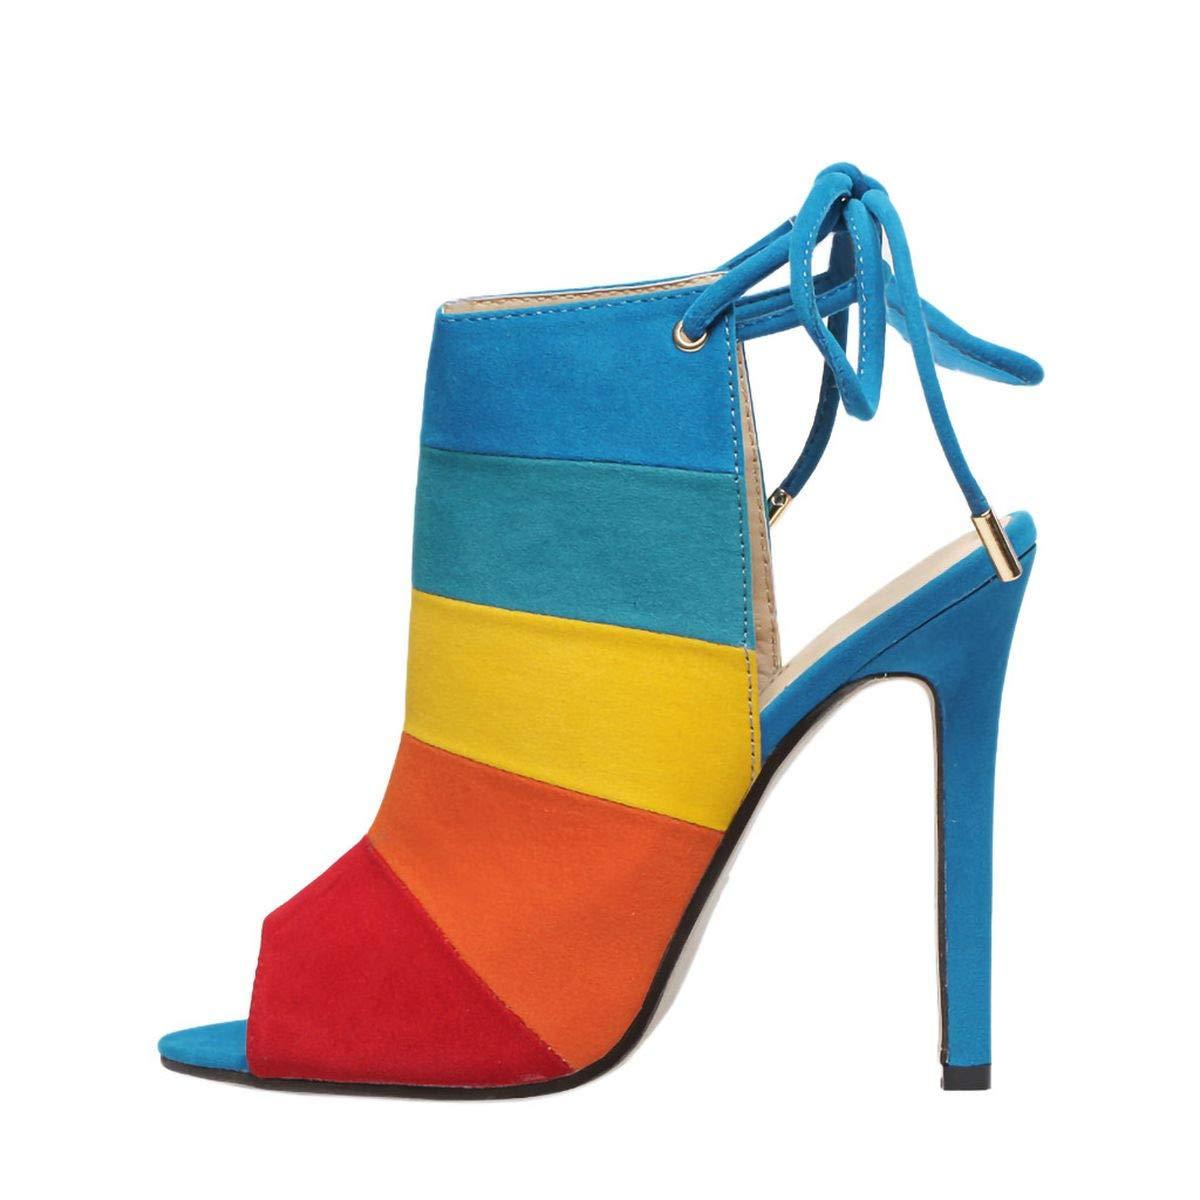 Women's Slingbacks Peep Toe Stilettos High Heels Shoes Roman Lace-up Sturdy Pumps Rainbow Fish Mouth Sandals (Multicolor, 7)